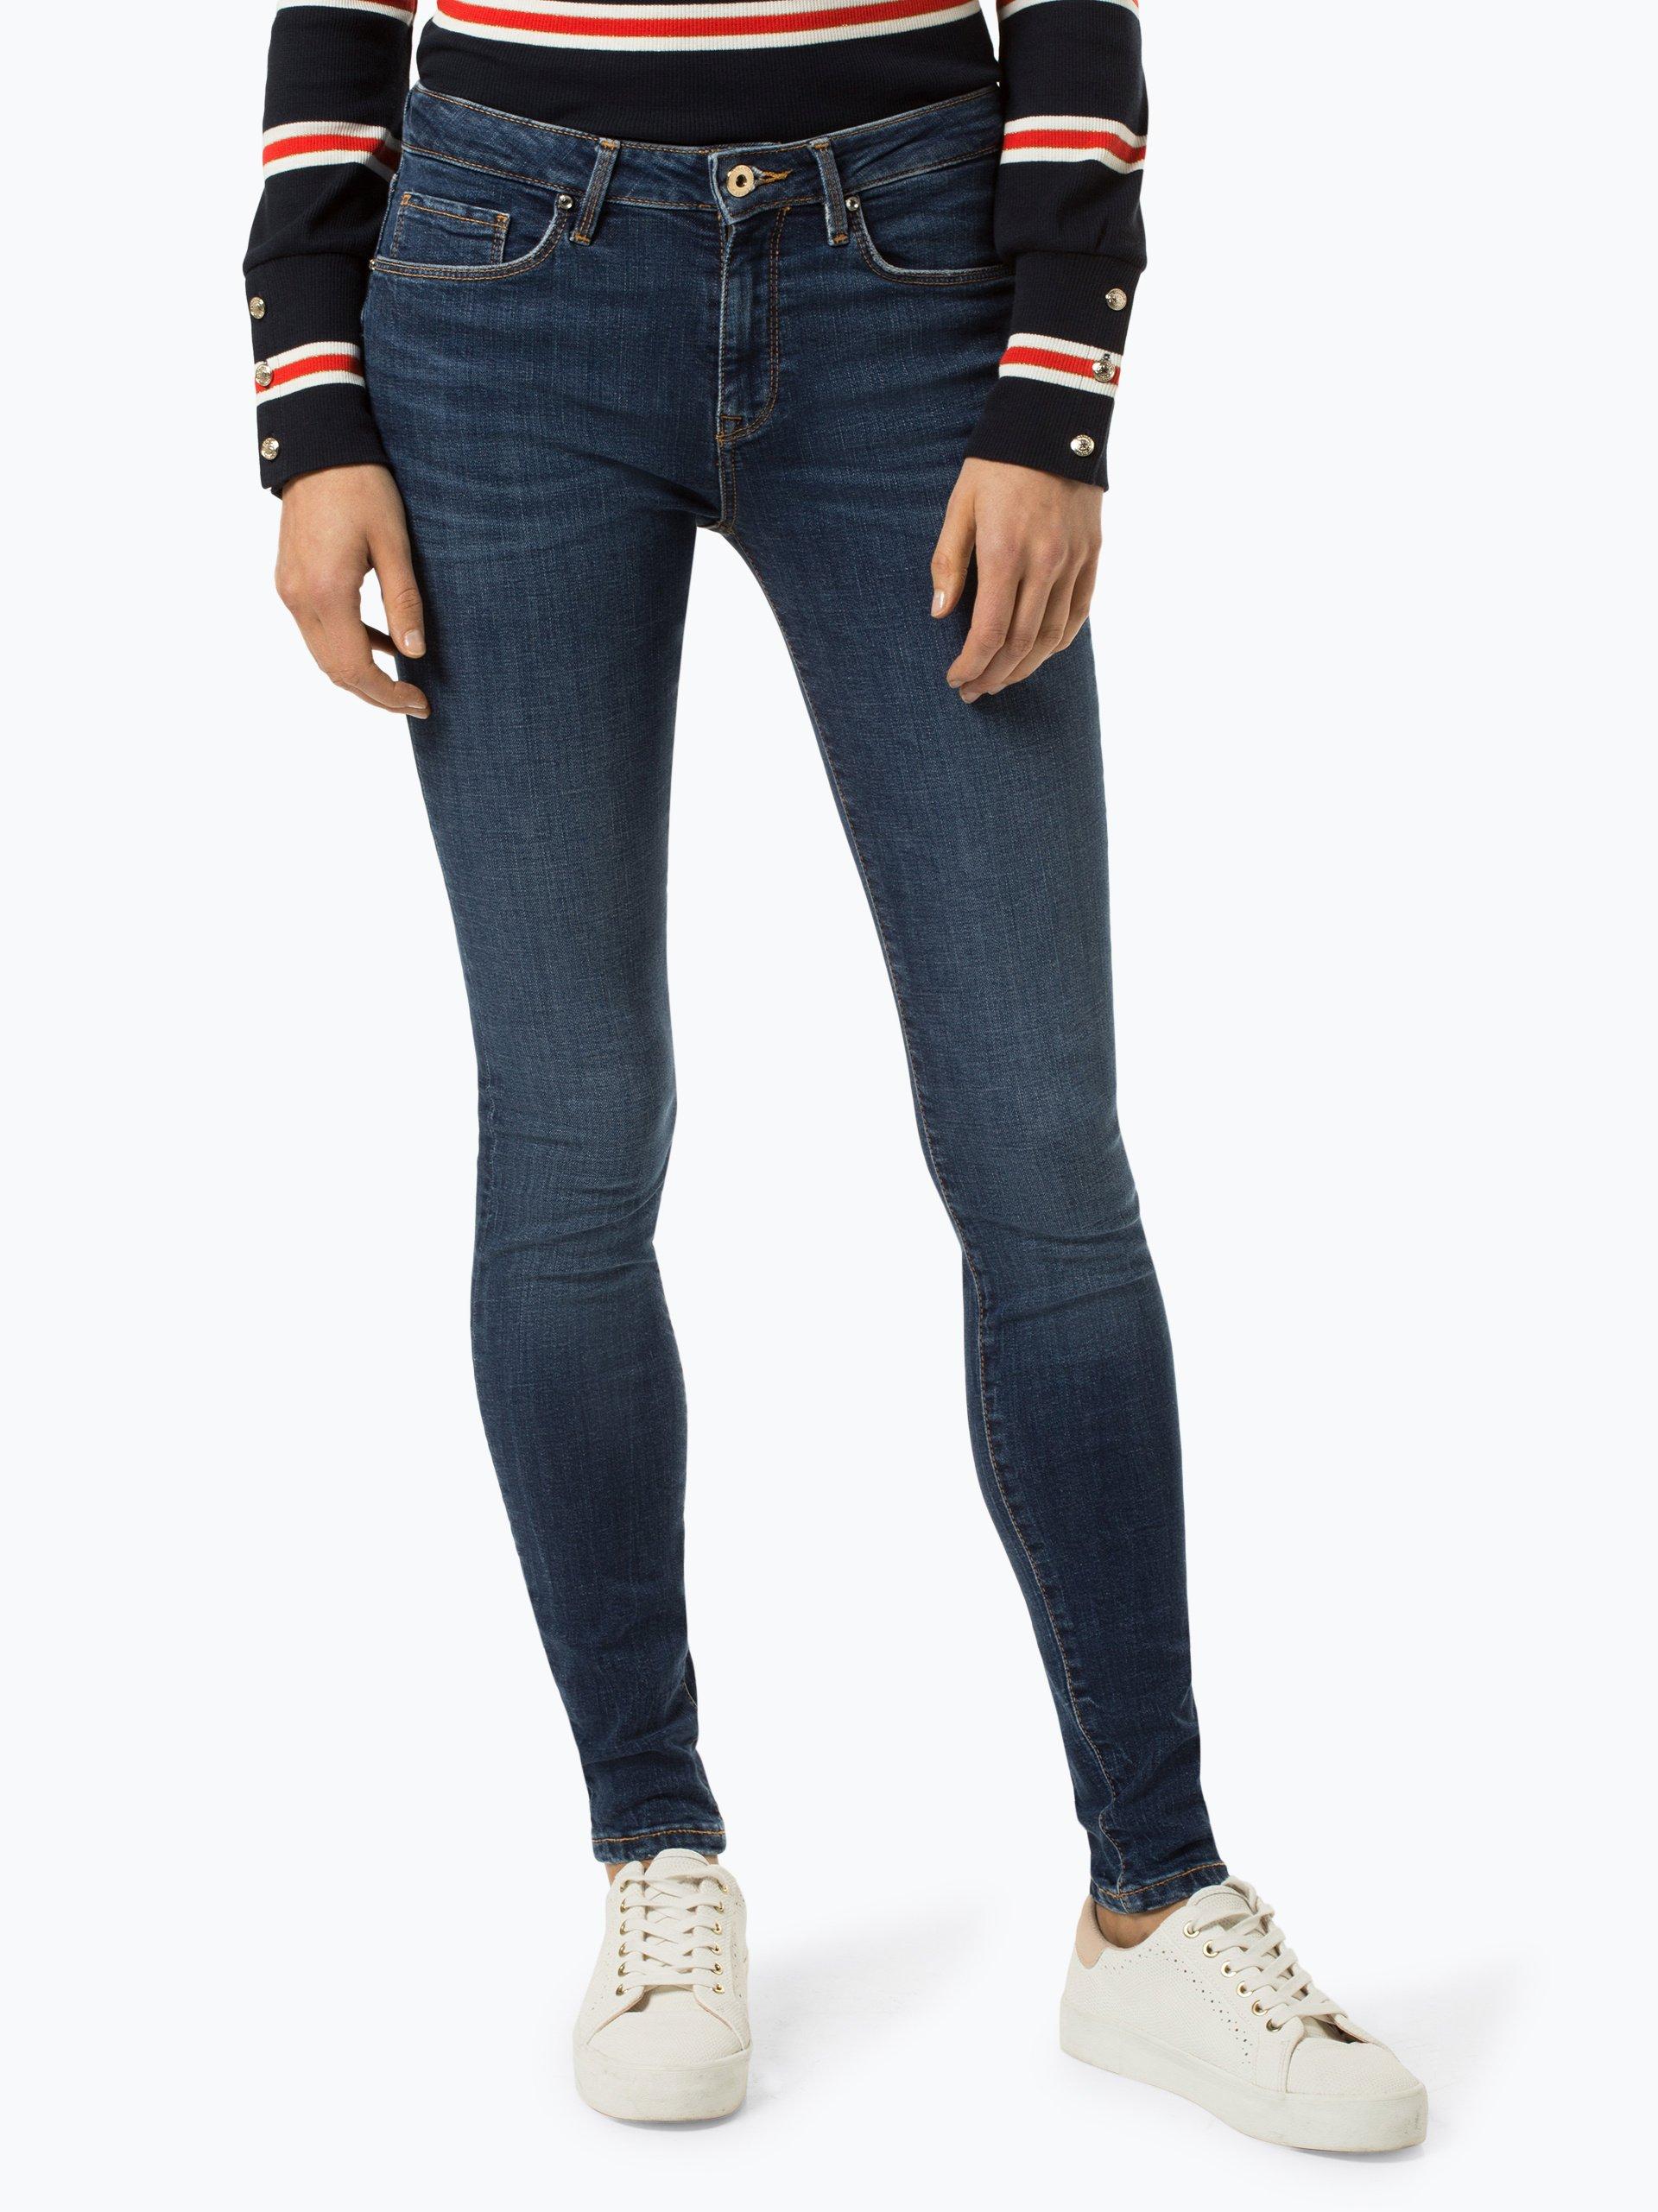 Tommy Hilfiger Damen Jeans - Como